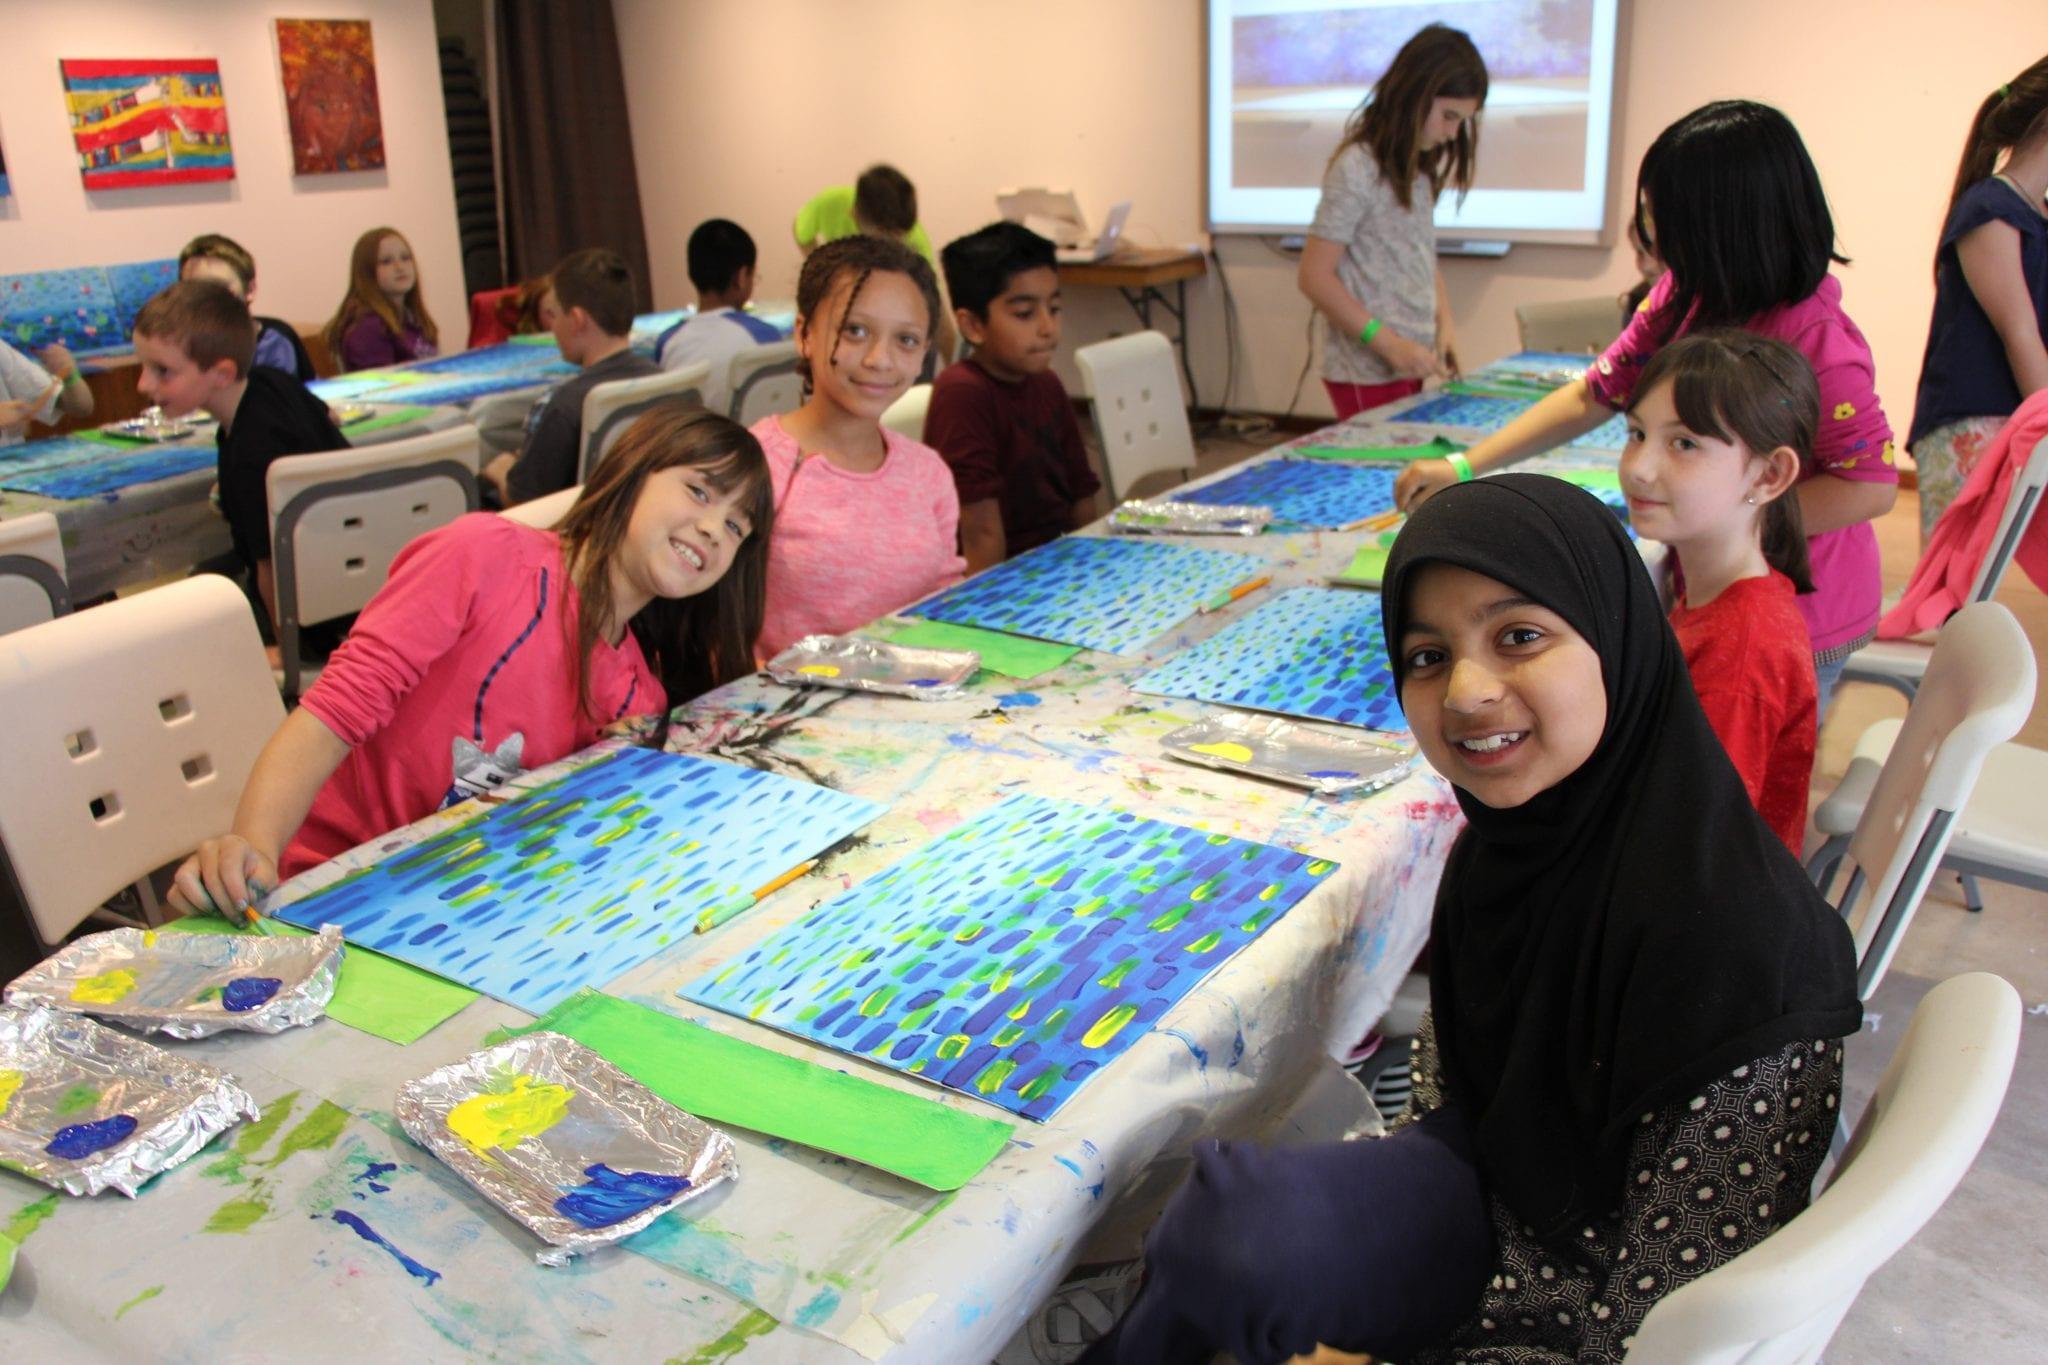 Children's art-making birthday party at the MacLaren Art Centre